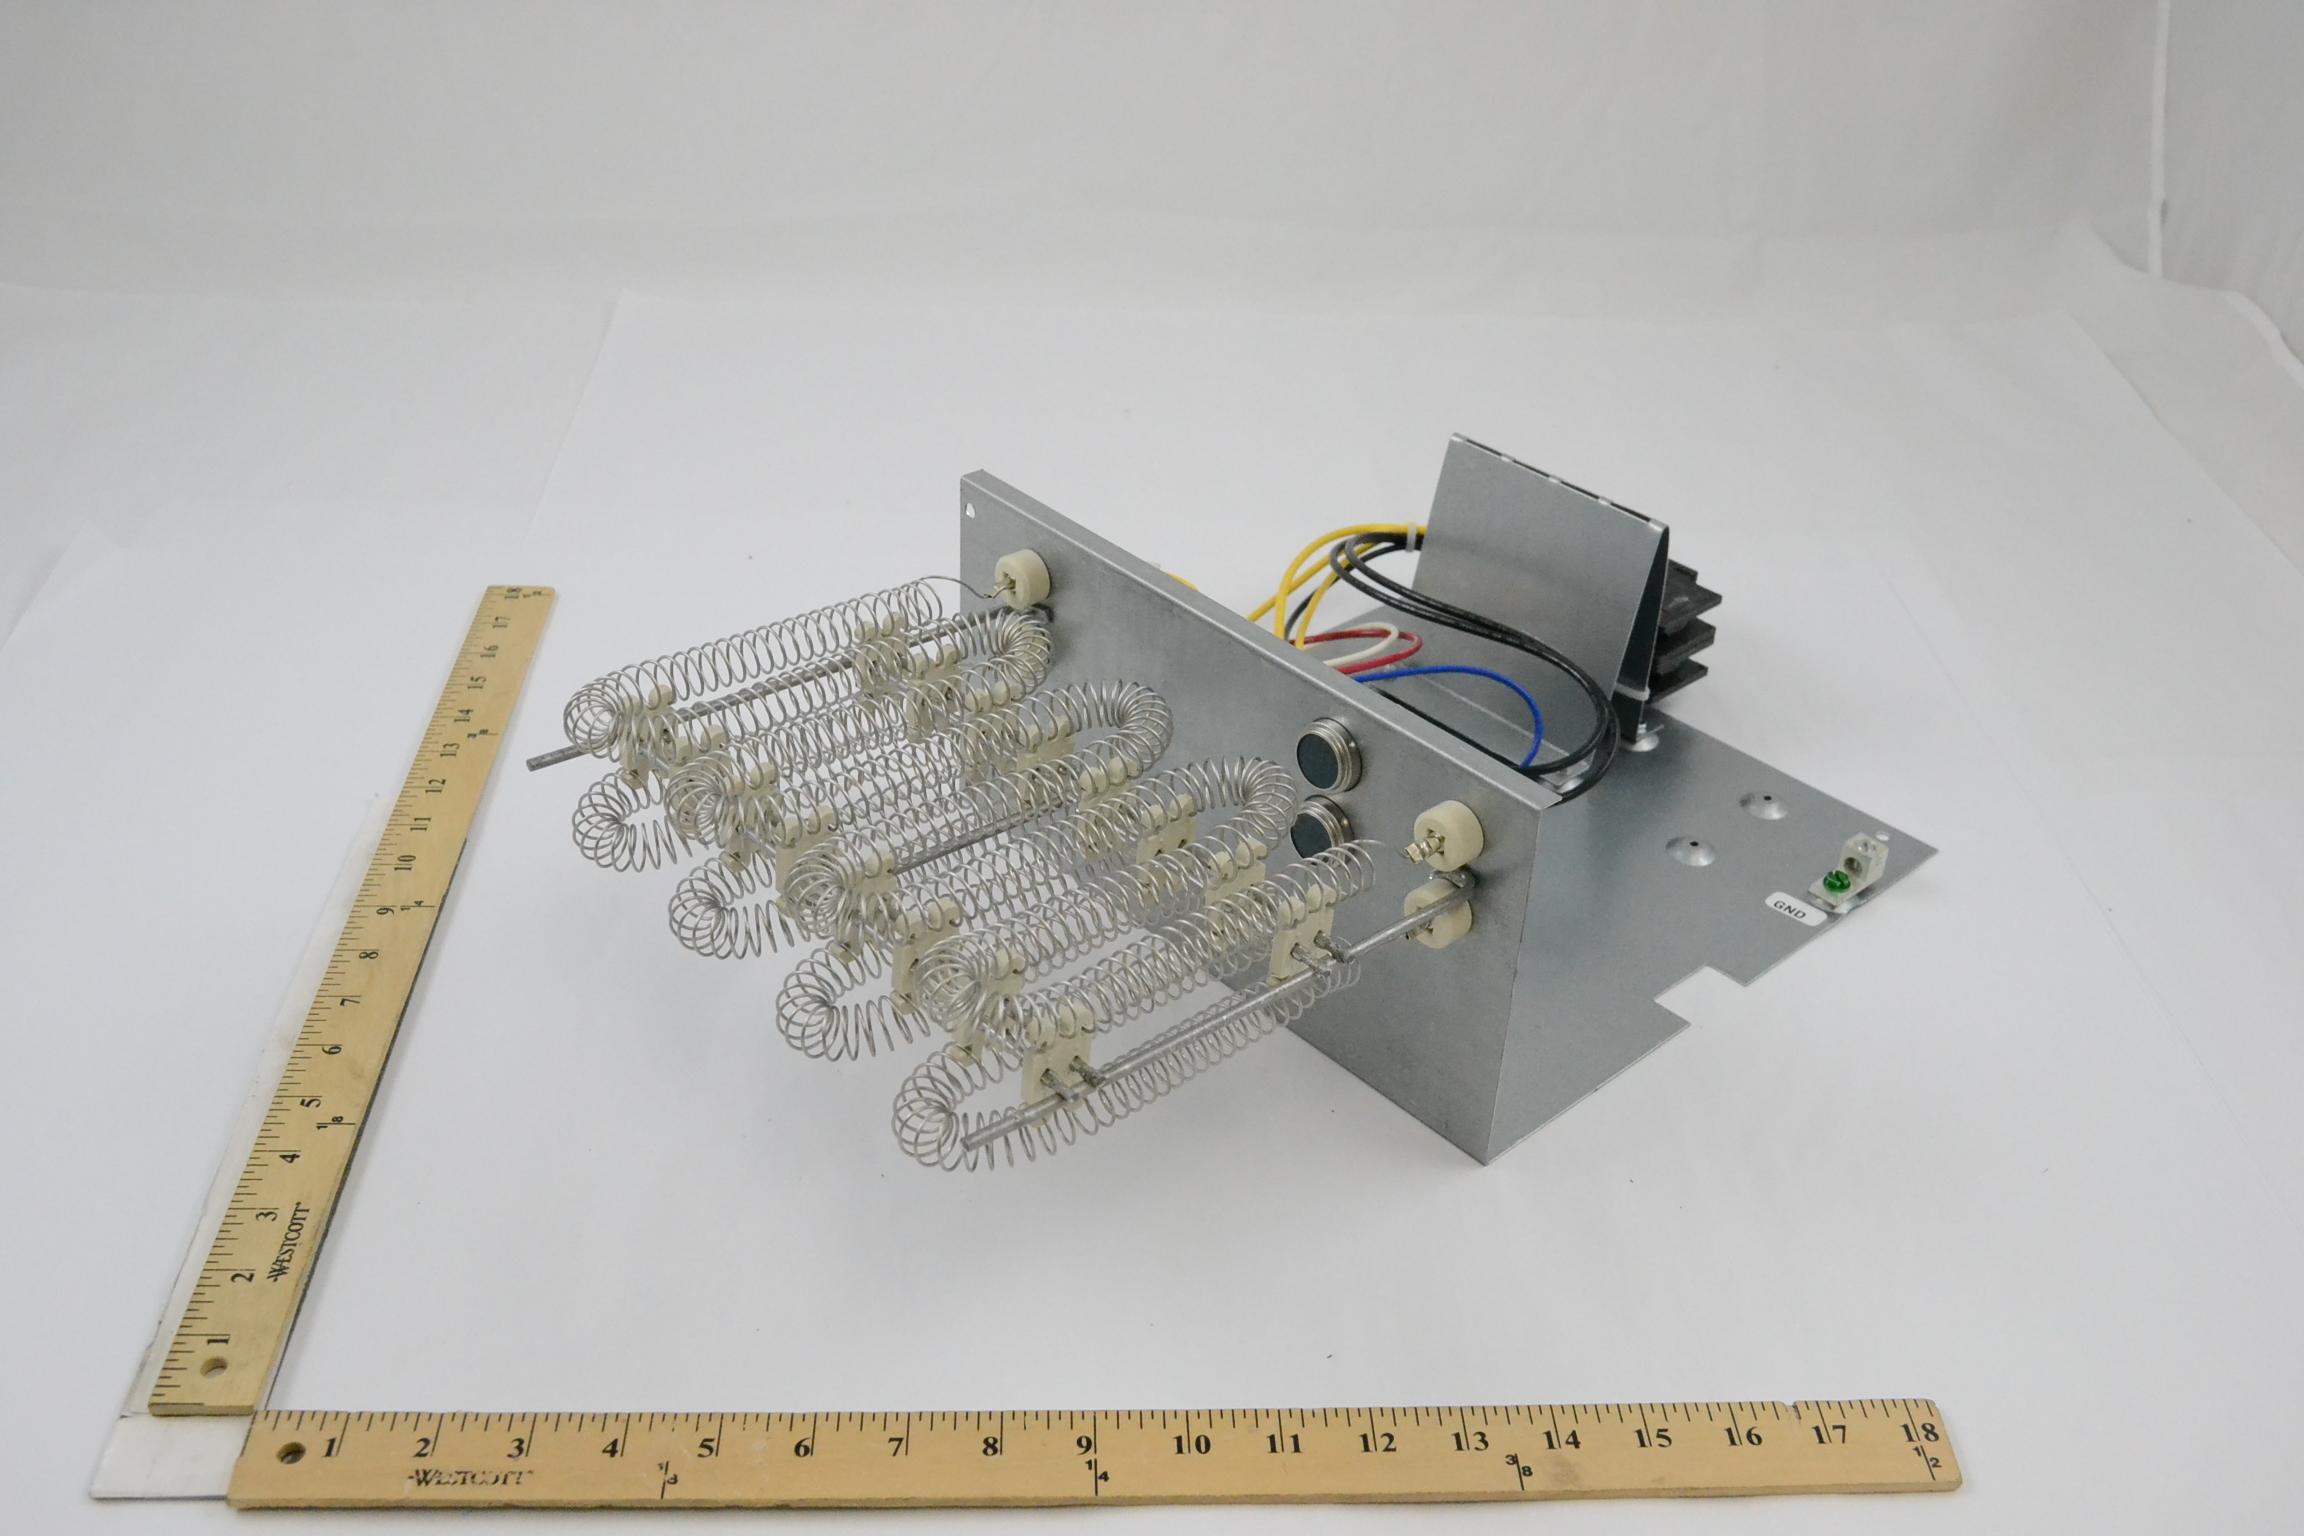 Armstrong Ac Heat Strip Wiring Diagrams Nordyne Pump Diagram With 15 Kw Furnace Aehbcc07csa 1 Kit 7 5kw Goodman